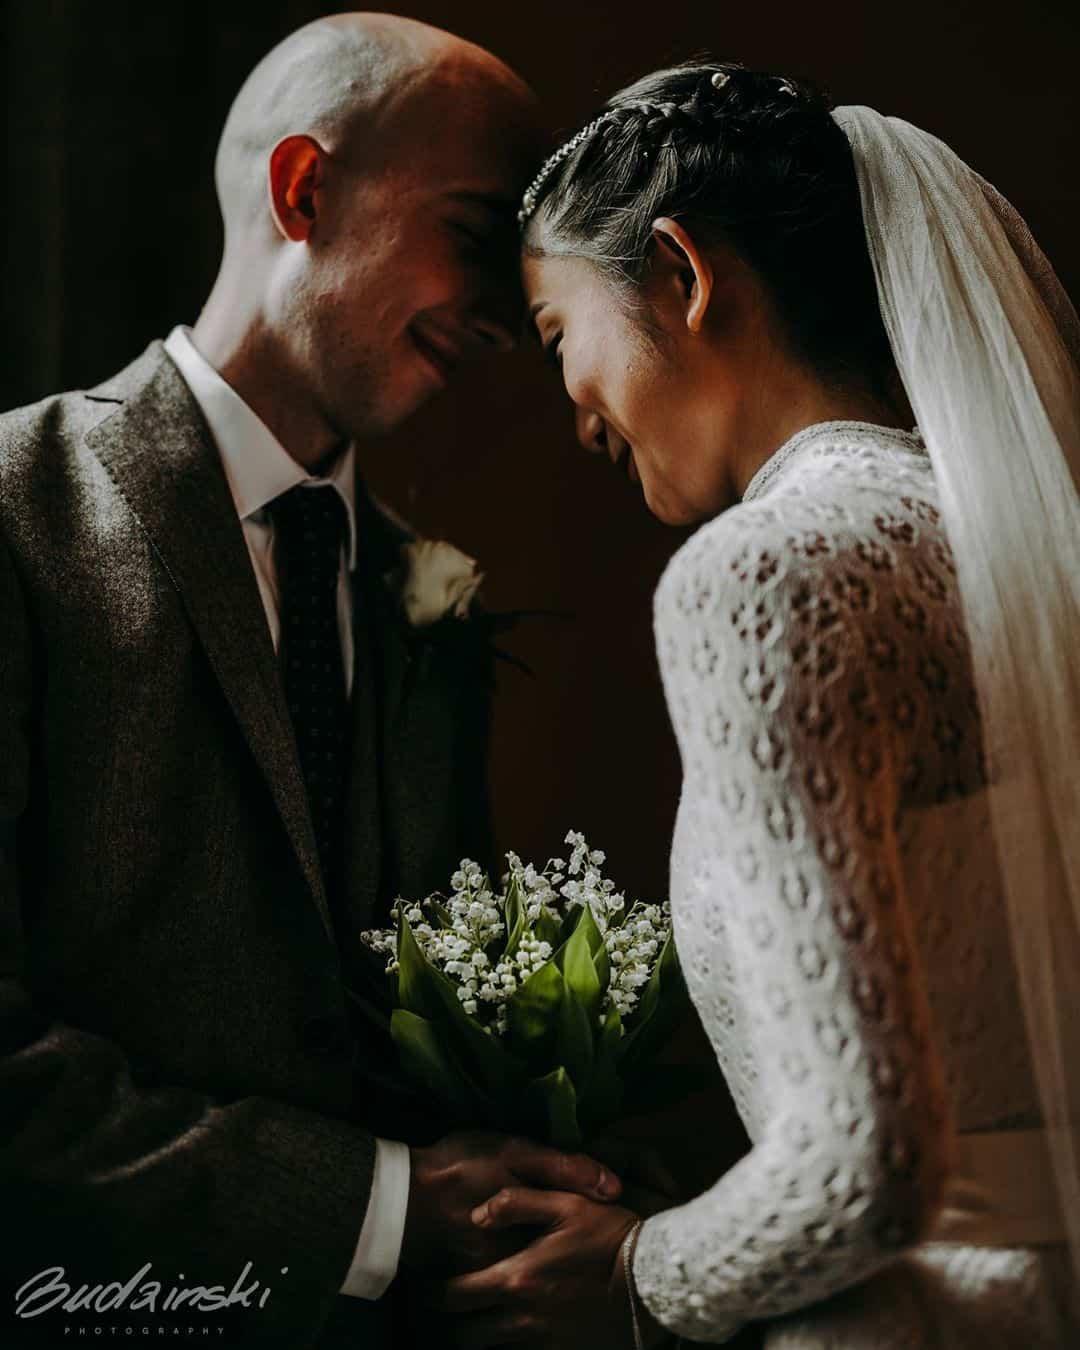 paul-budzinski-glasgow-scottish-wedding-photographer-bride-groom-bouquet